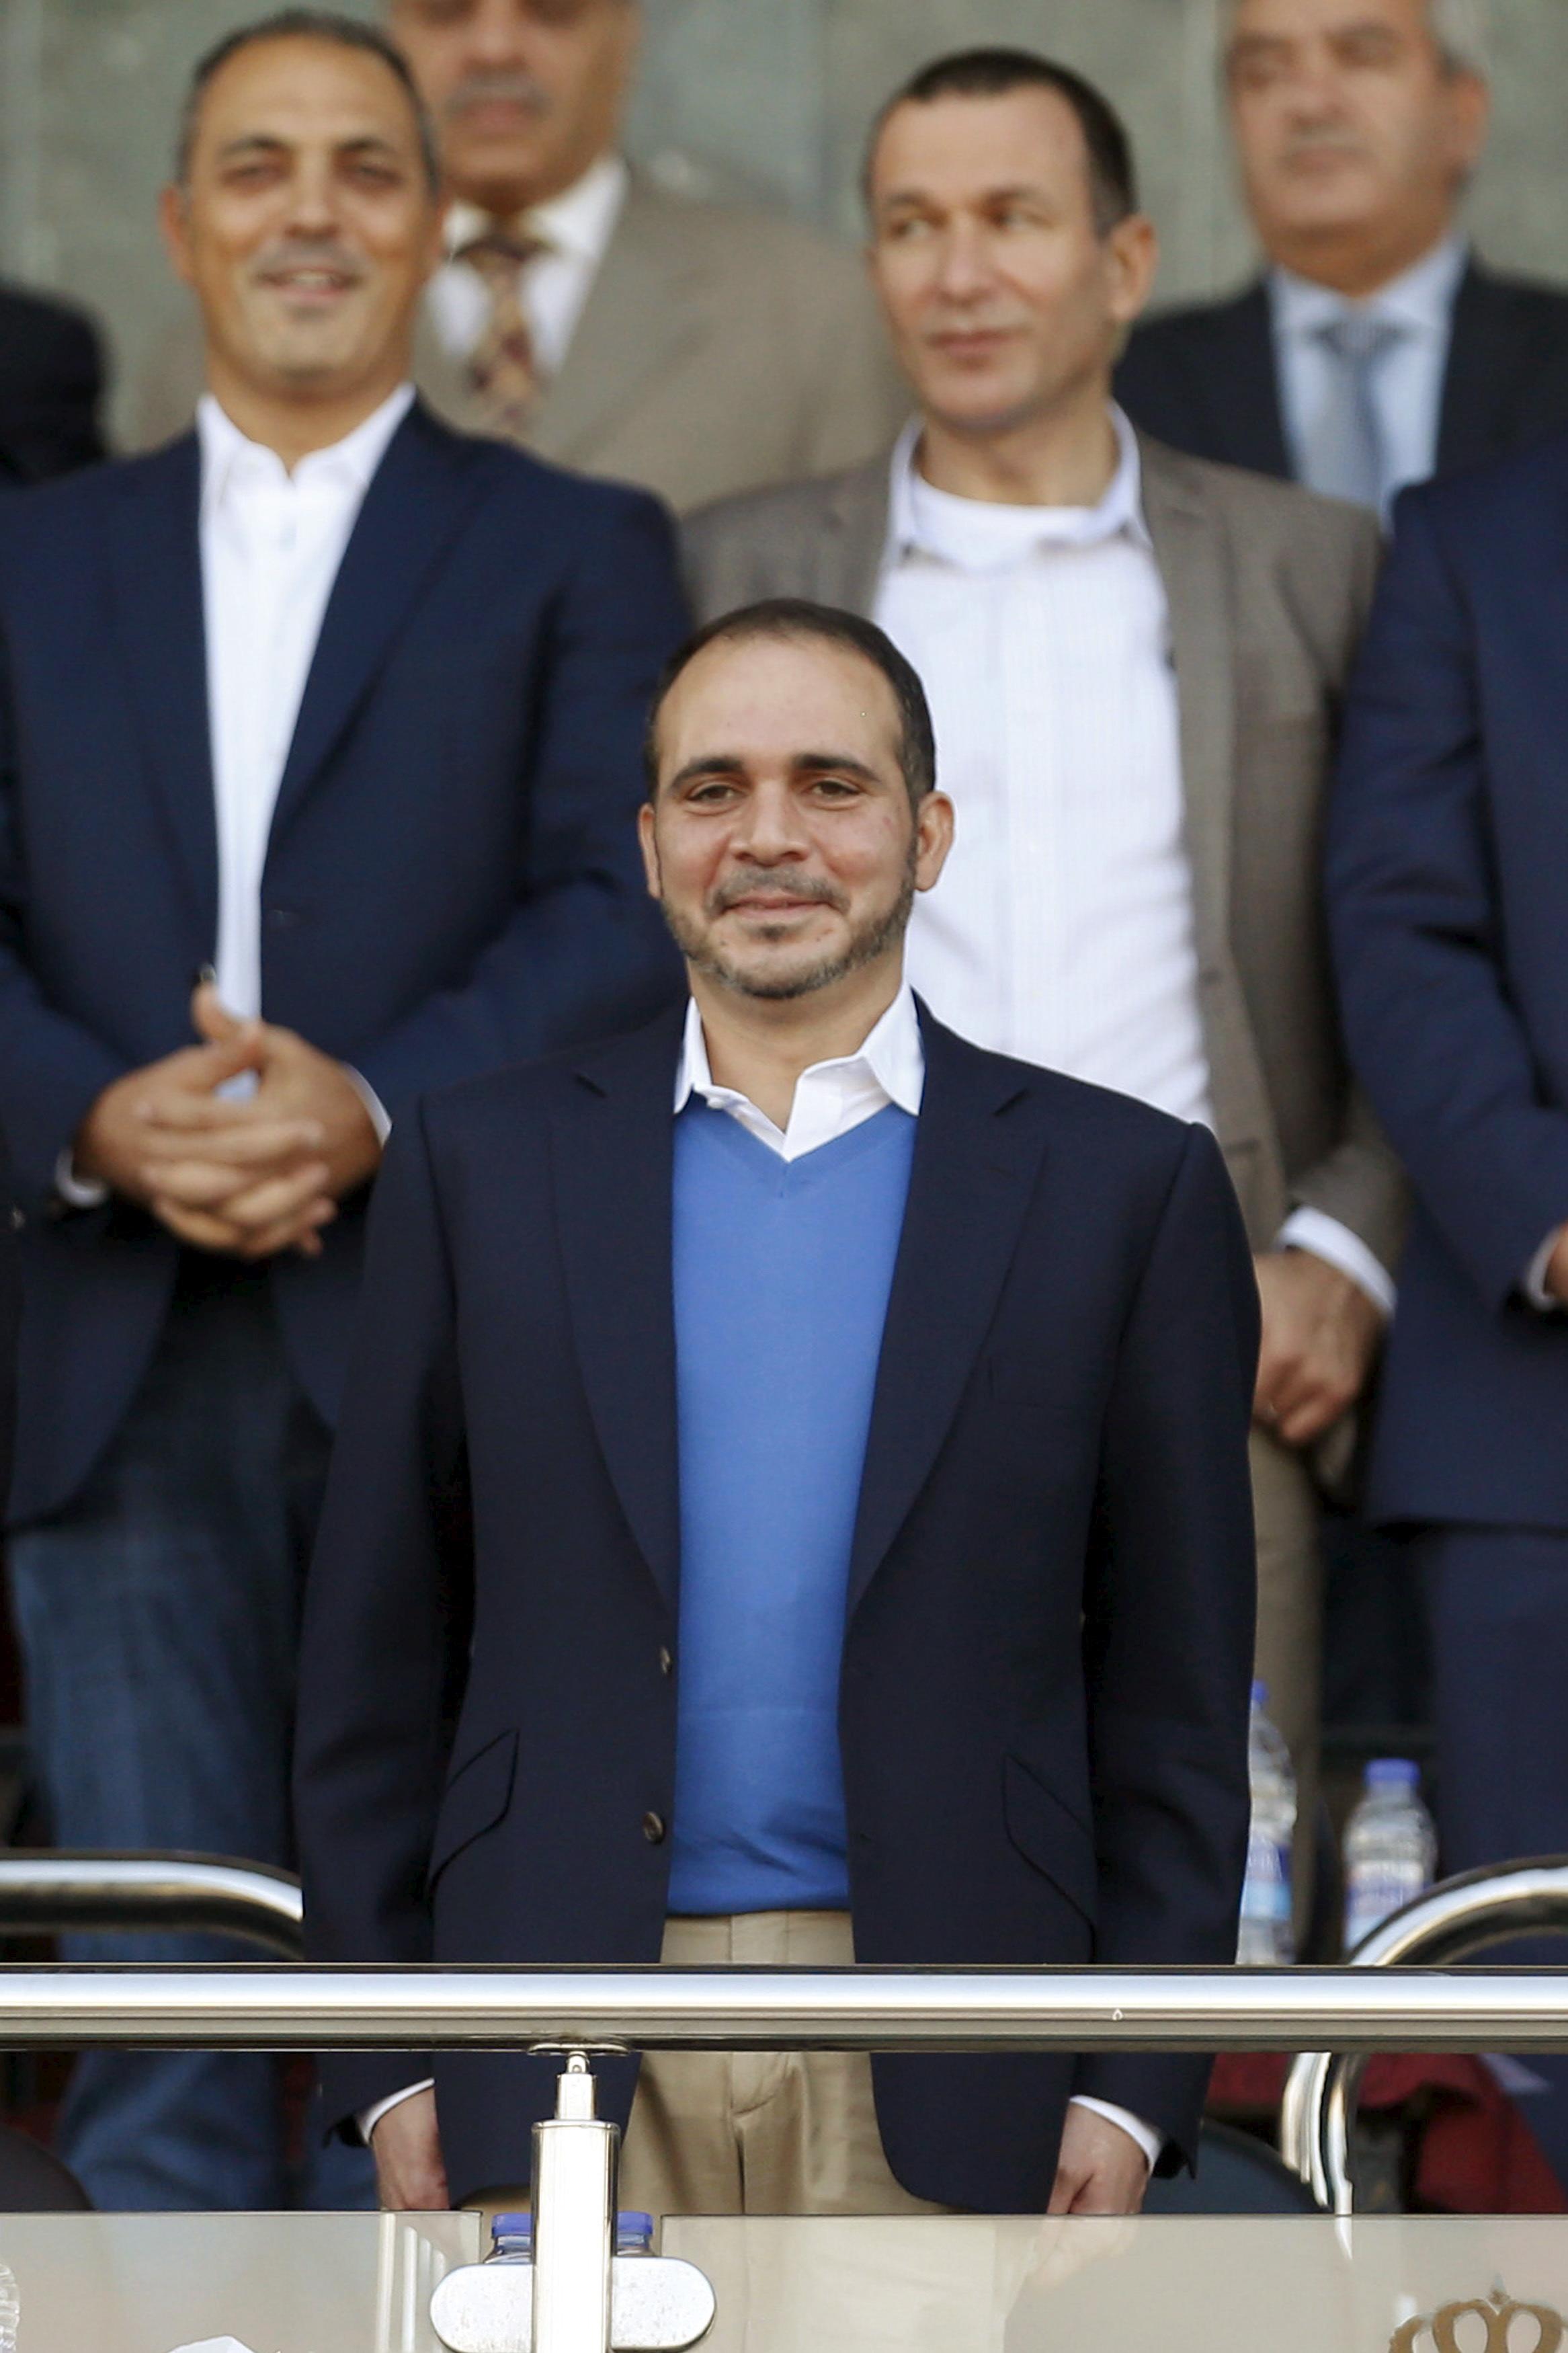 Jordanian Prince Ali bin Al Hussein (C) attends the 2018 World Cup qualifying soccer match between Jordan and Australia at the Amman International Stadium in Amman, Jordan October 8, 2015.